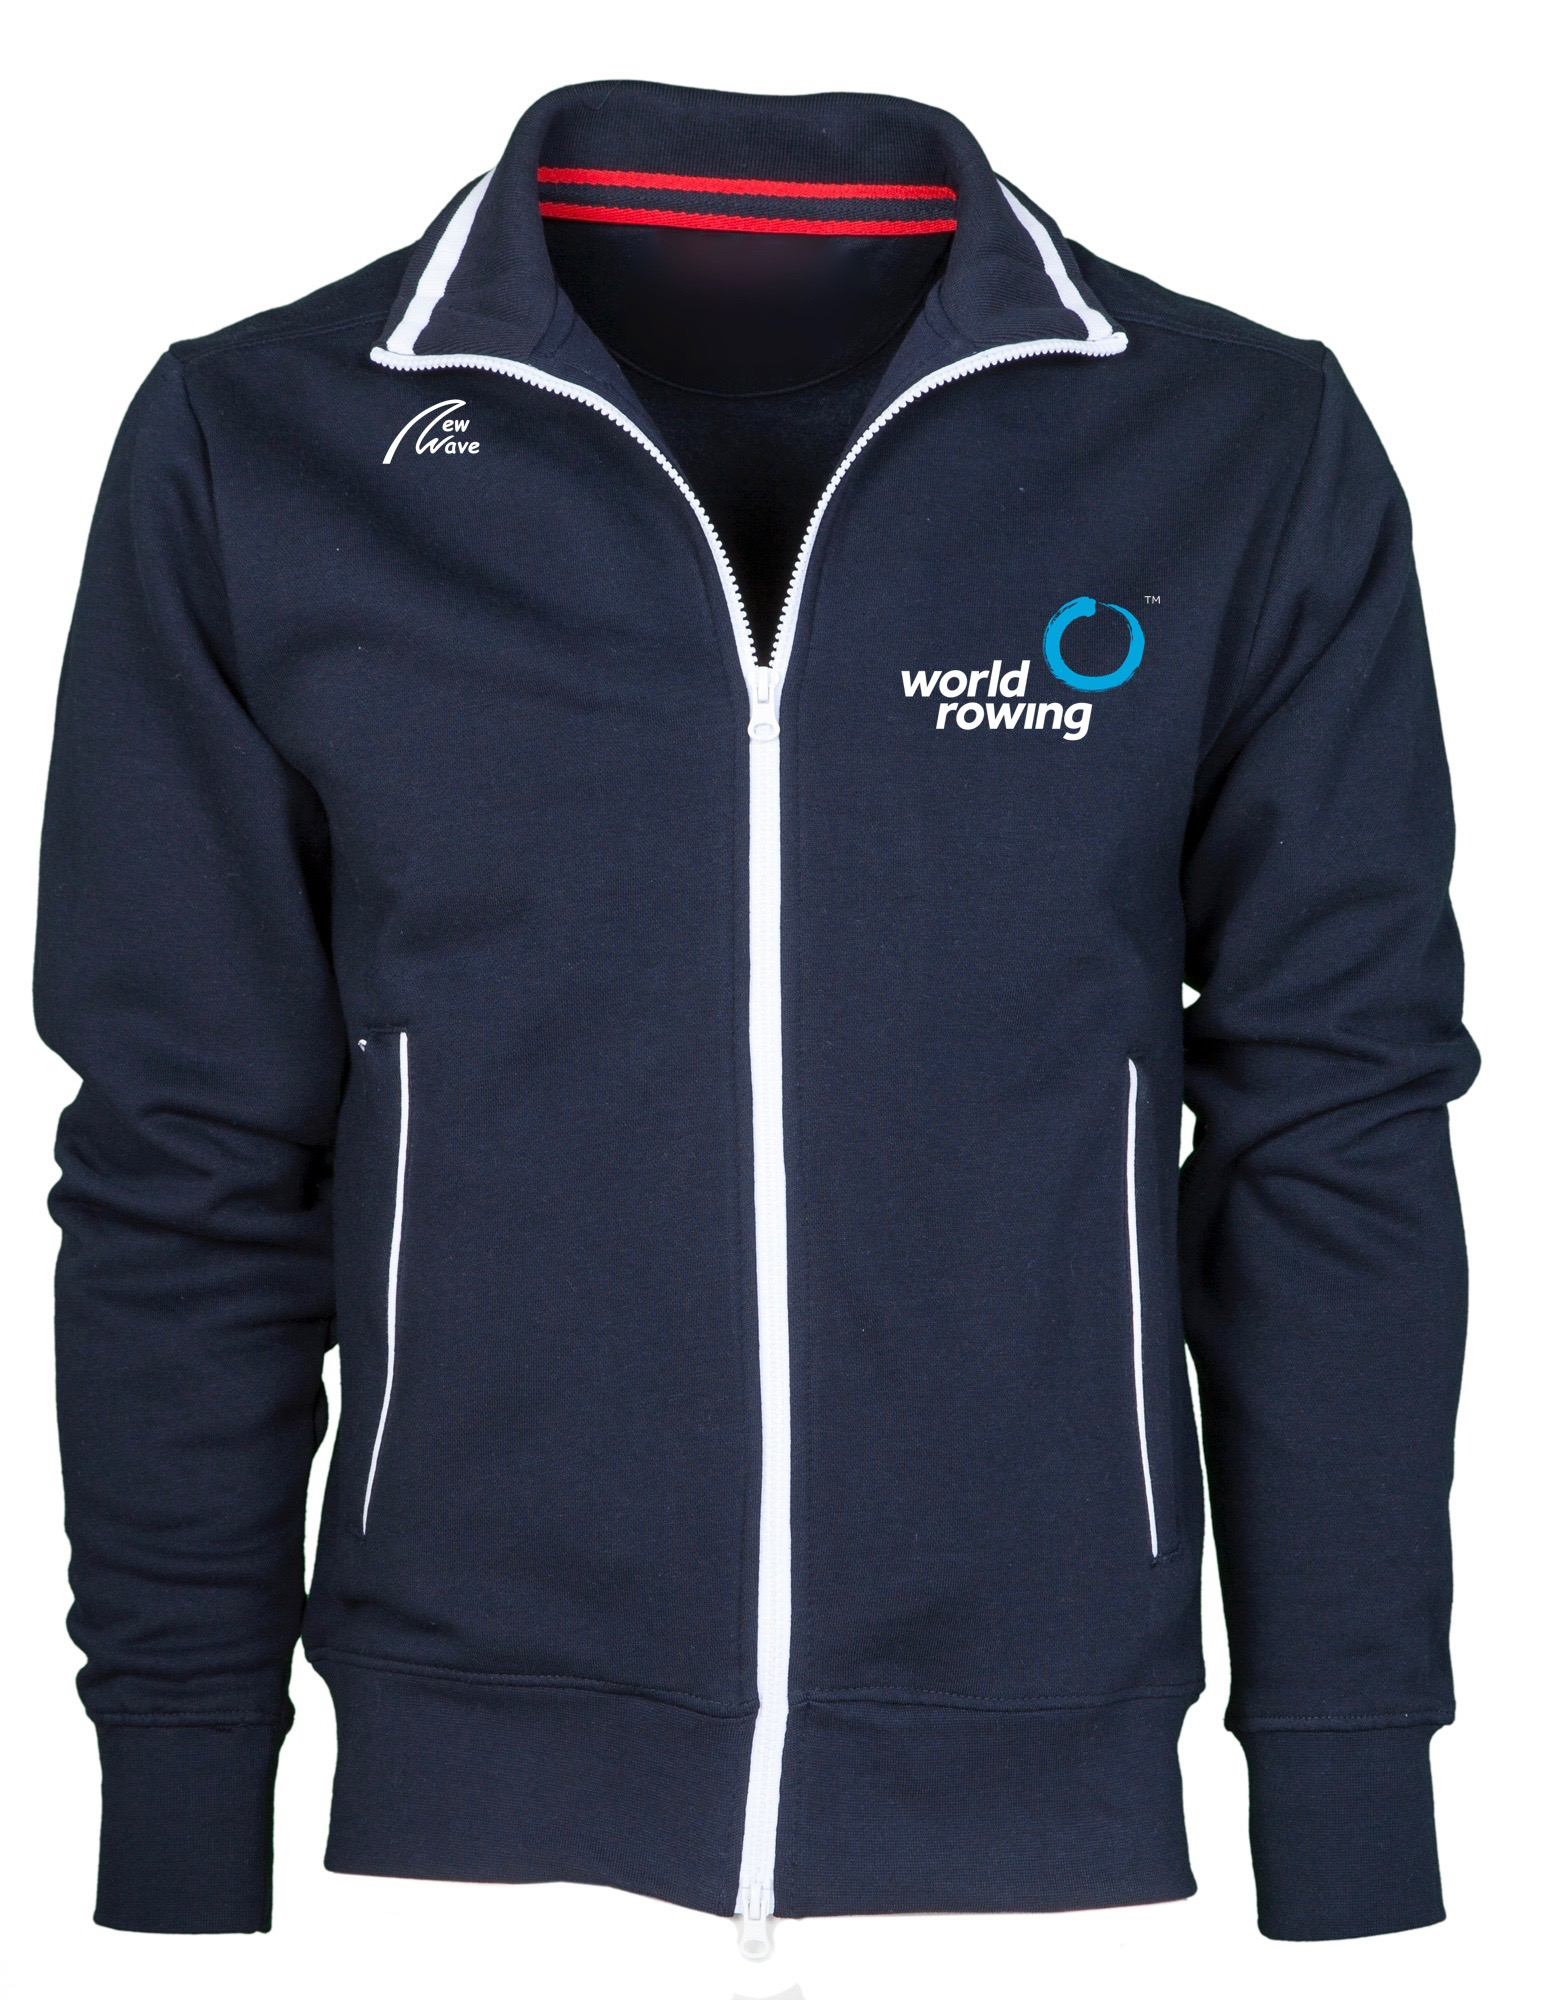 World Rowing Old School Jacket Man - Navy, NW Logo Brust oben rechts, WR Logo 10cm Brust lins, WR Logo 25cm Rücken